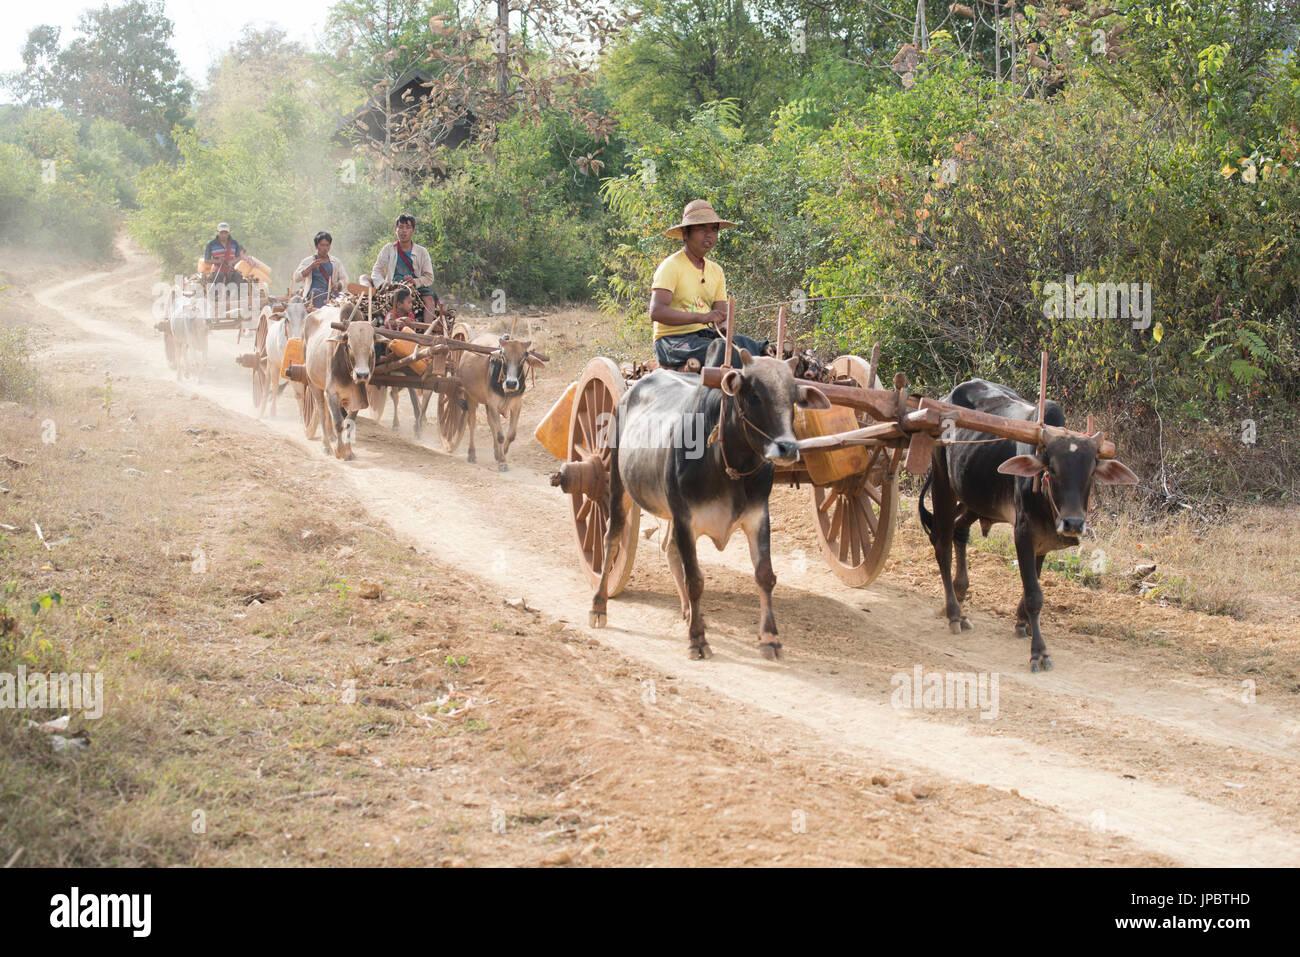 Cow Pulling Wagon : Cows pulling cart stockfotos bilder